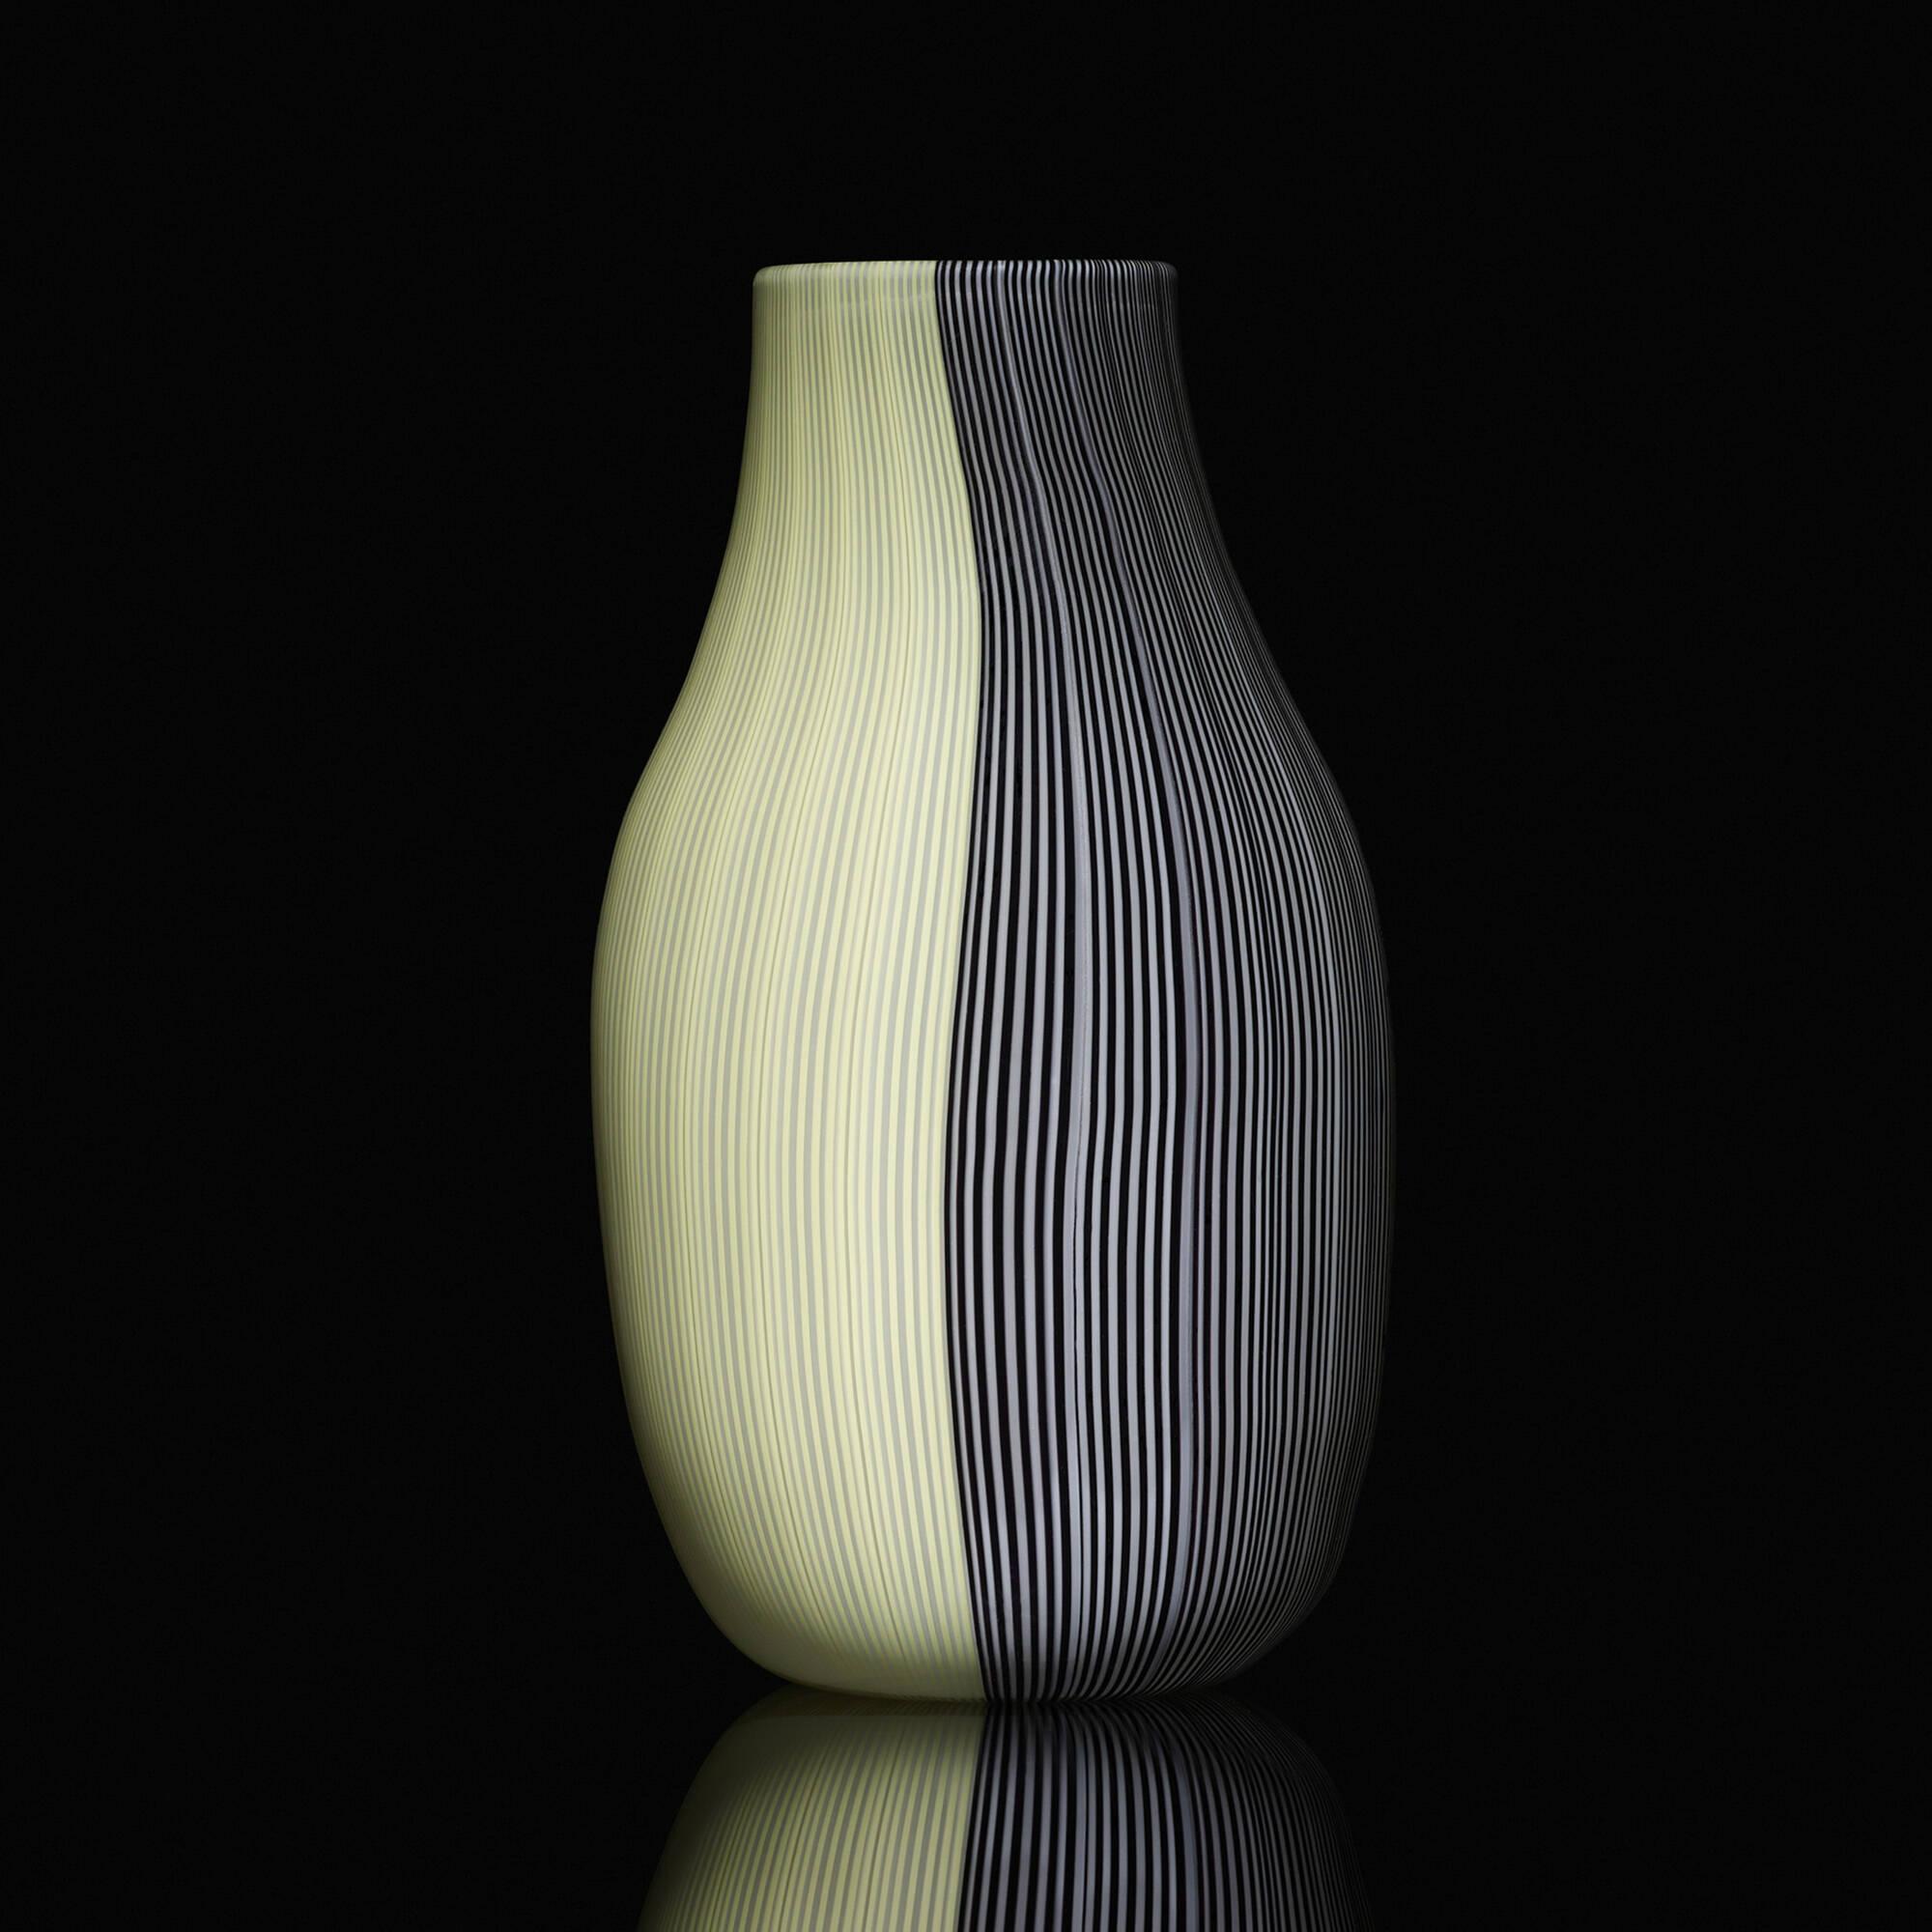 204 carlo scarpa tessuto vase important italian glass 8 june 204 carlo scarpa tessuto vase 1 of 5 floridaeventfo Image collections